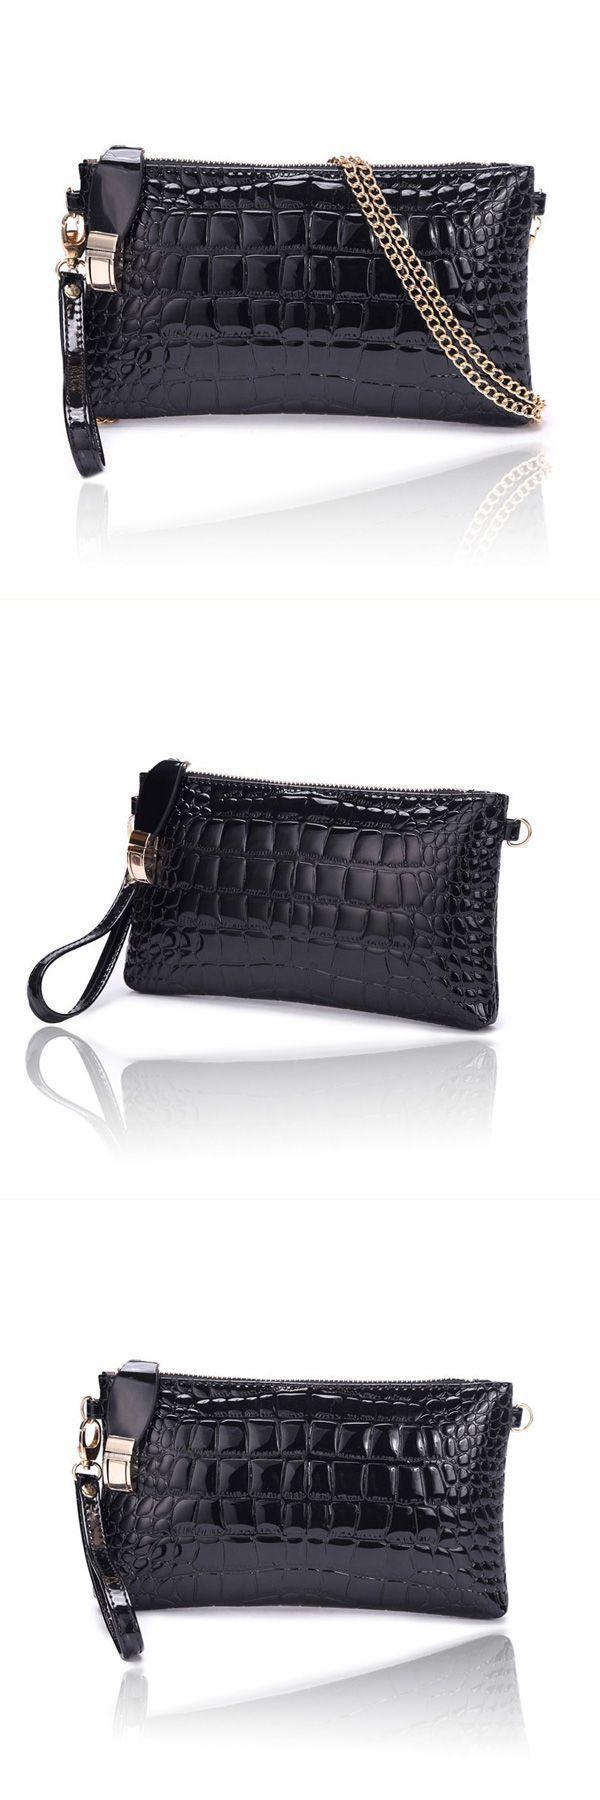 Women 8217 S Crocodile Pattern Chain Clutch Handbag Shoulder Diagonal Bags Handmade